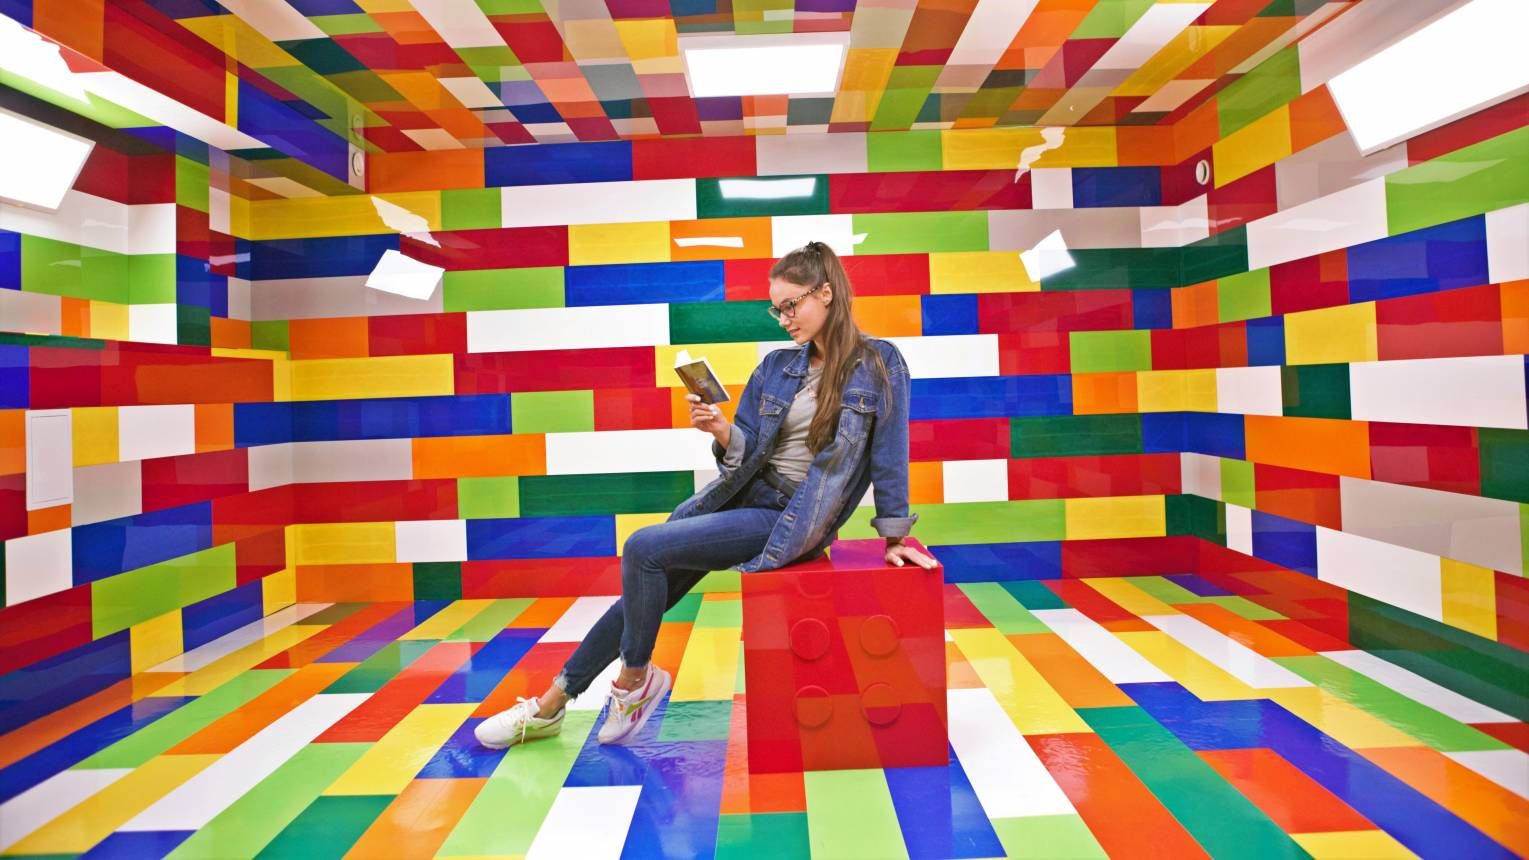 Belépő a Museum of Sweets & Selfies Origin Selfie múzeumba